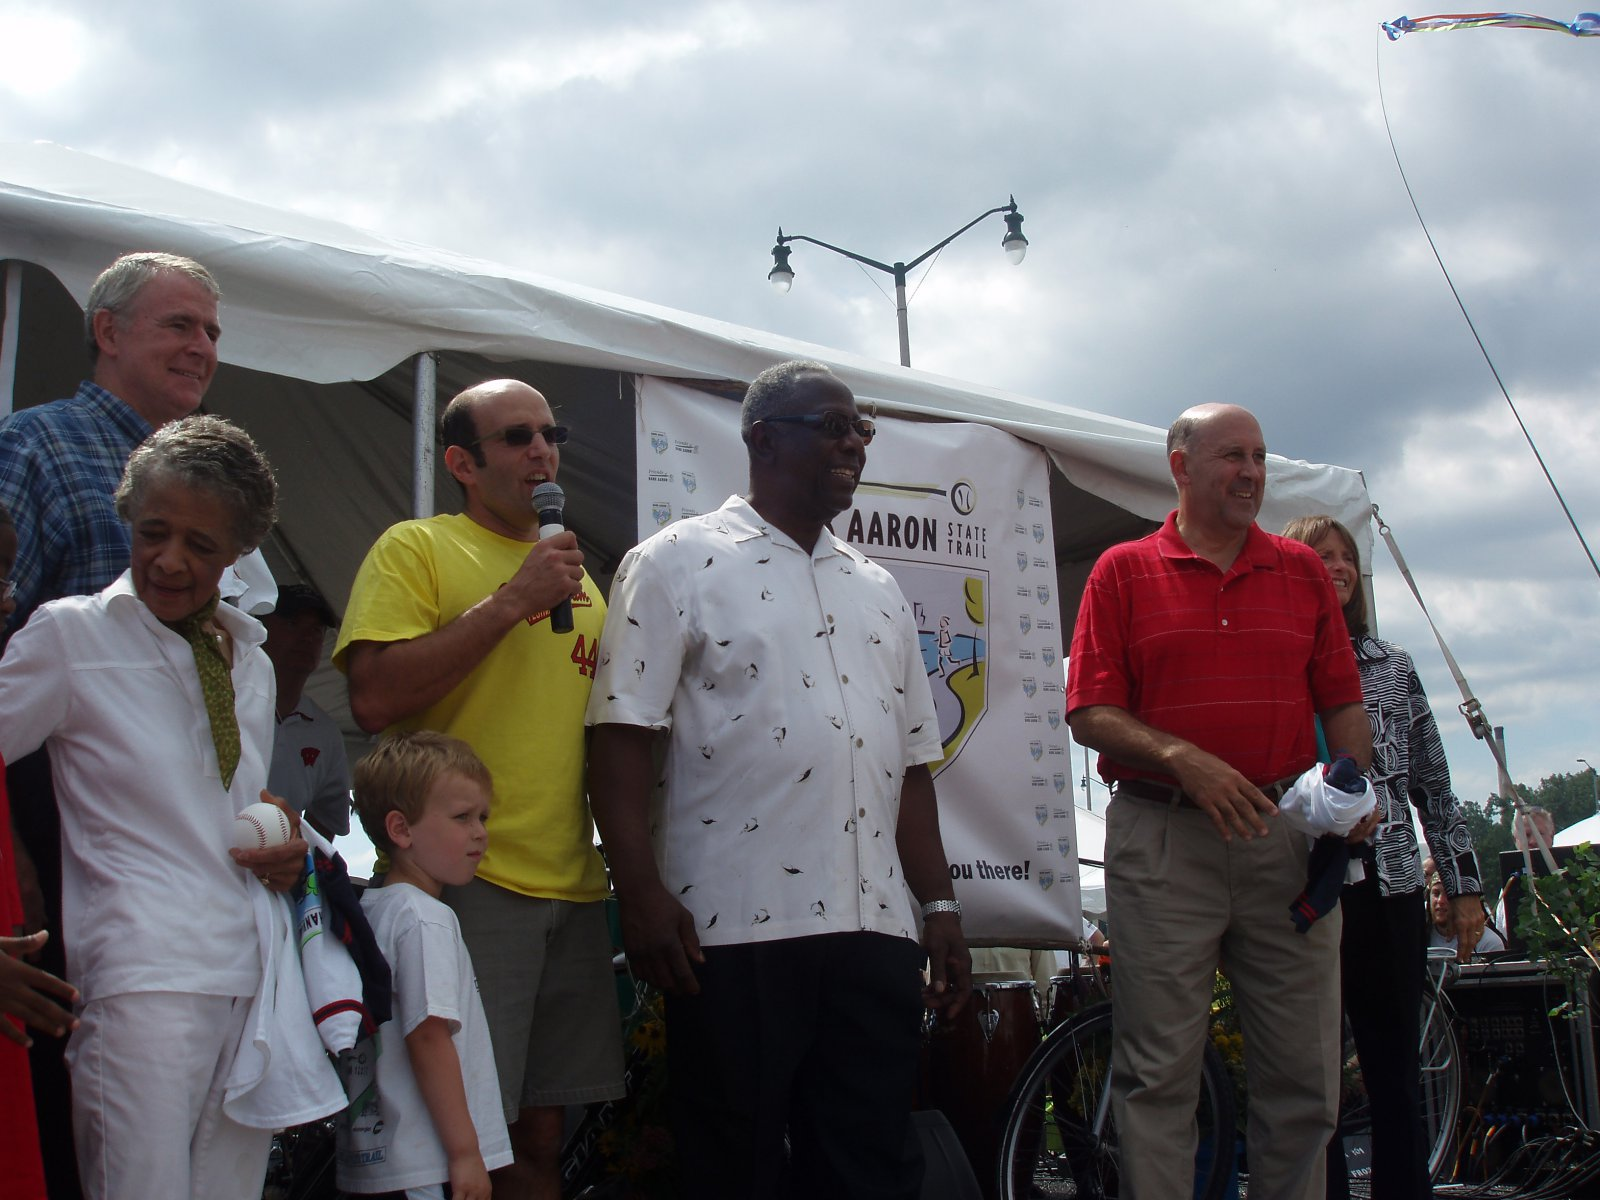 (left to right) Mayor Barrett, Vel Phillips, Bruce Keyes, Hank Aaron, Governor Doyle